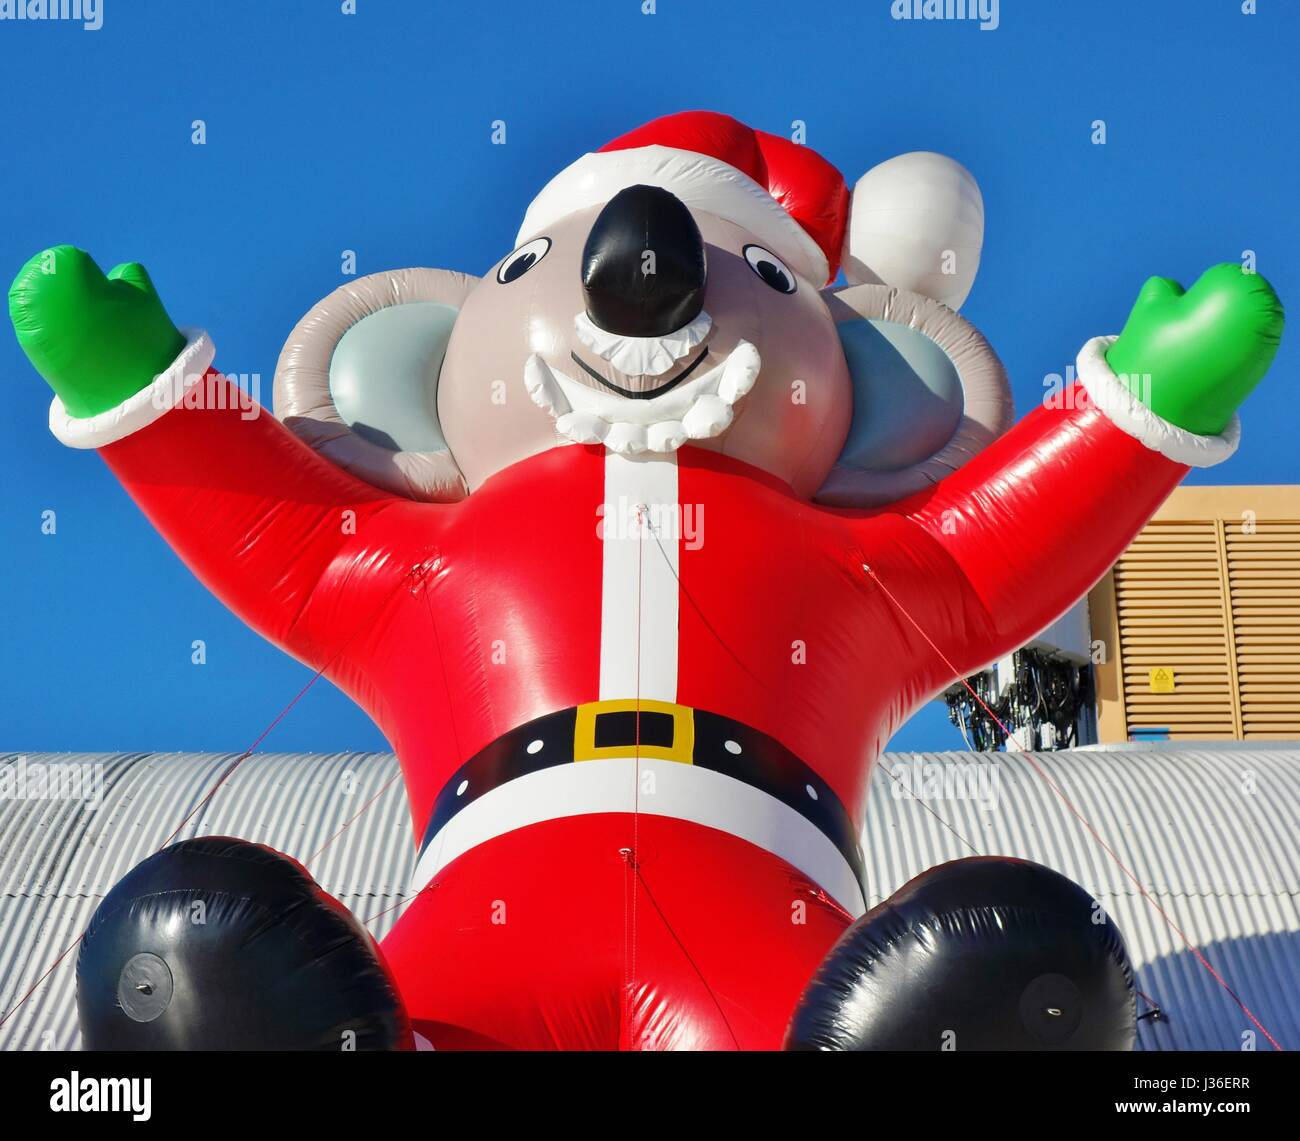 Australian Christmas Decorations Stock Photos & Australian